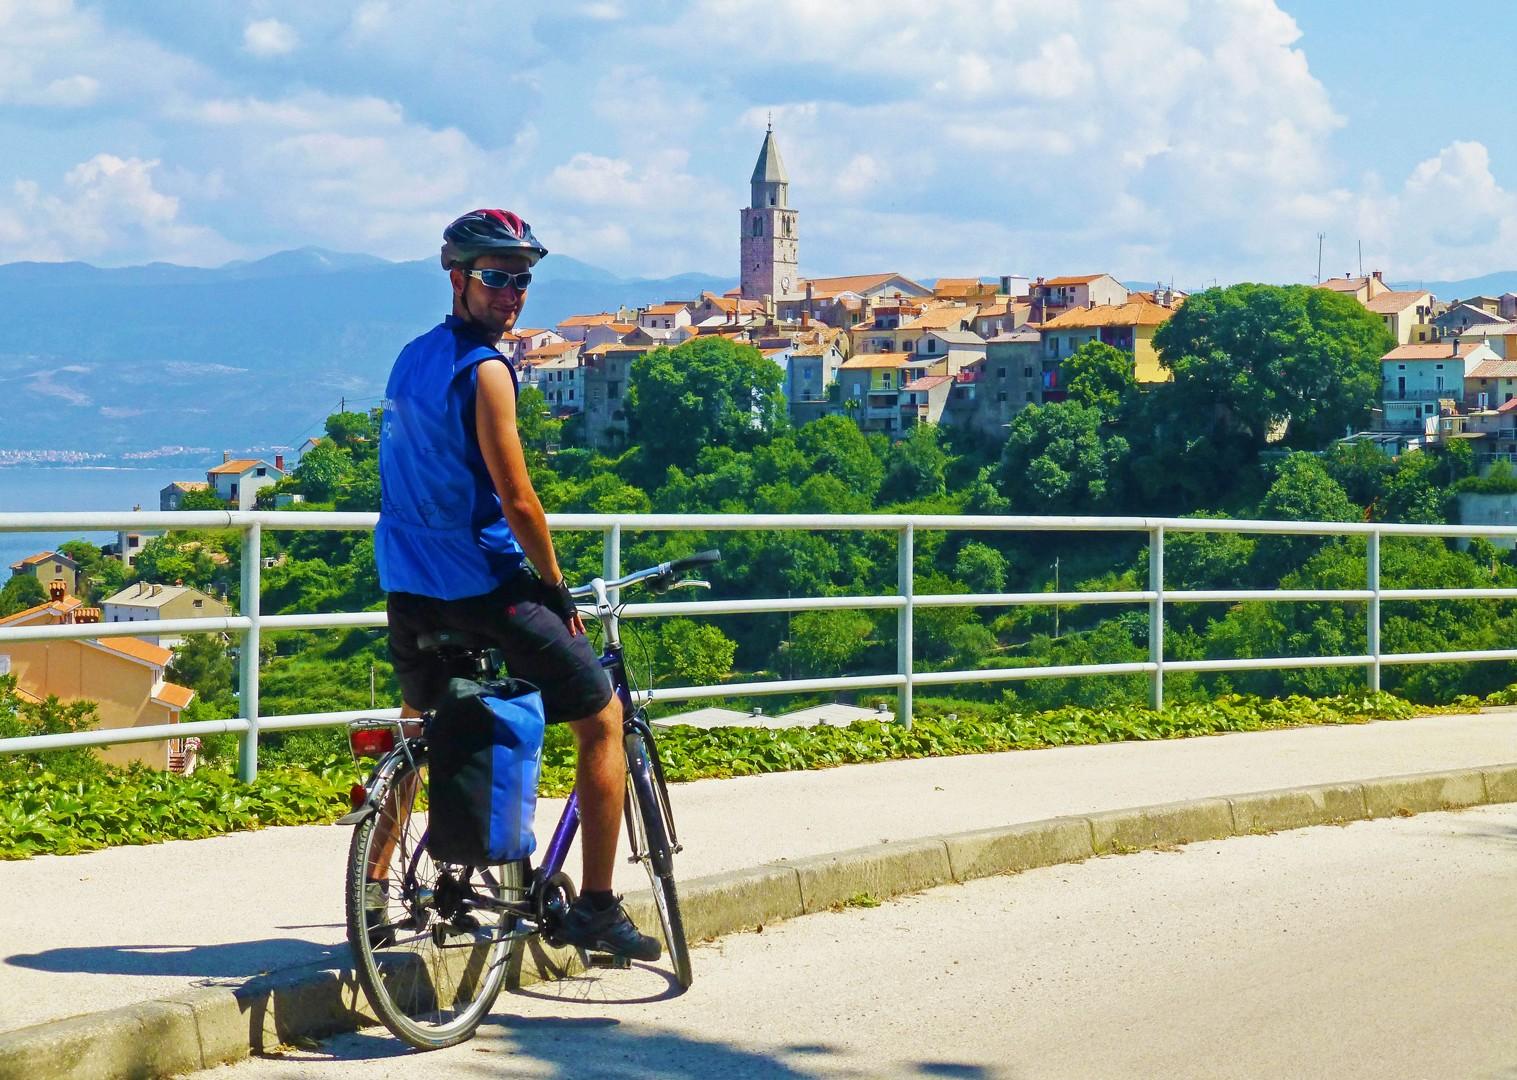 vrbnik-cycling-leisure-tour-saddle-skedaddle.jpg - Croatia - Kvarner Bay - Bike and Boat Holiday - Leisure Cycling